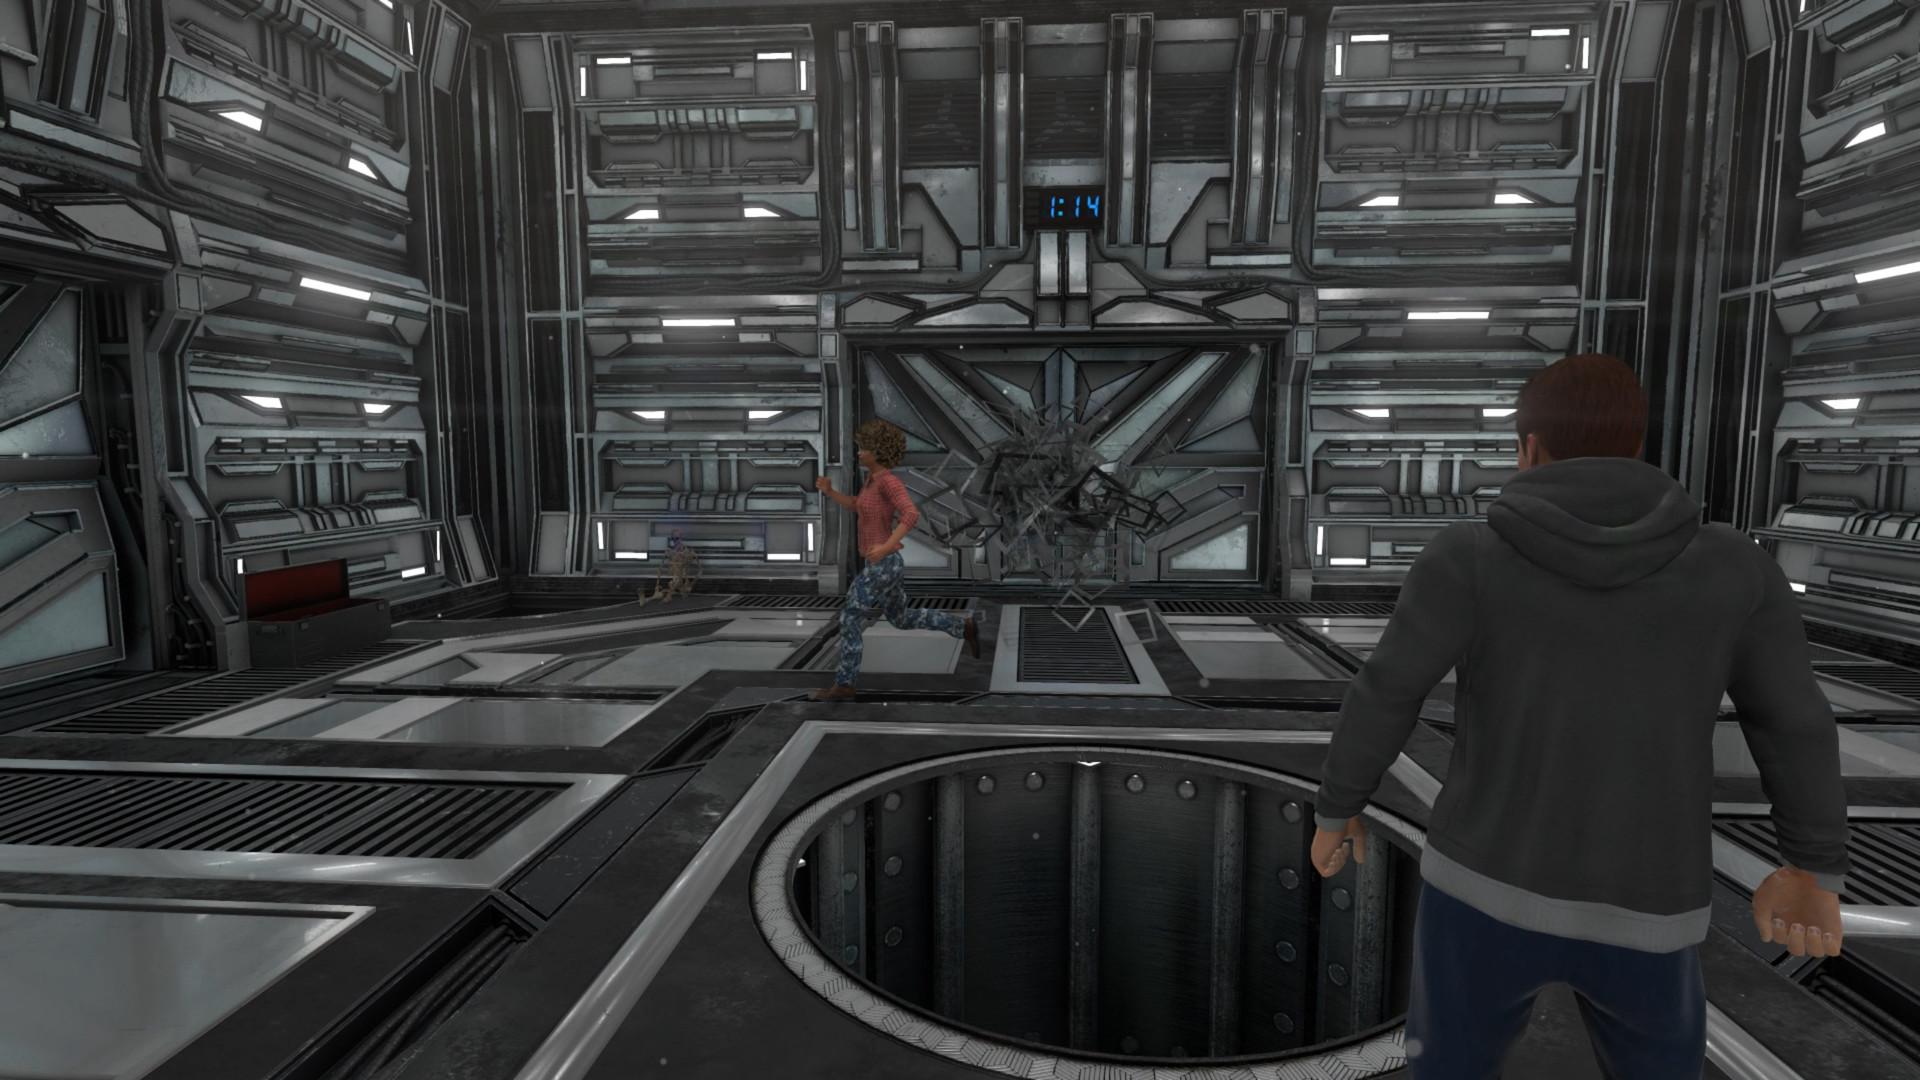 Link Tải Game HALF DEAD 2 miễn phí